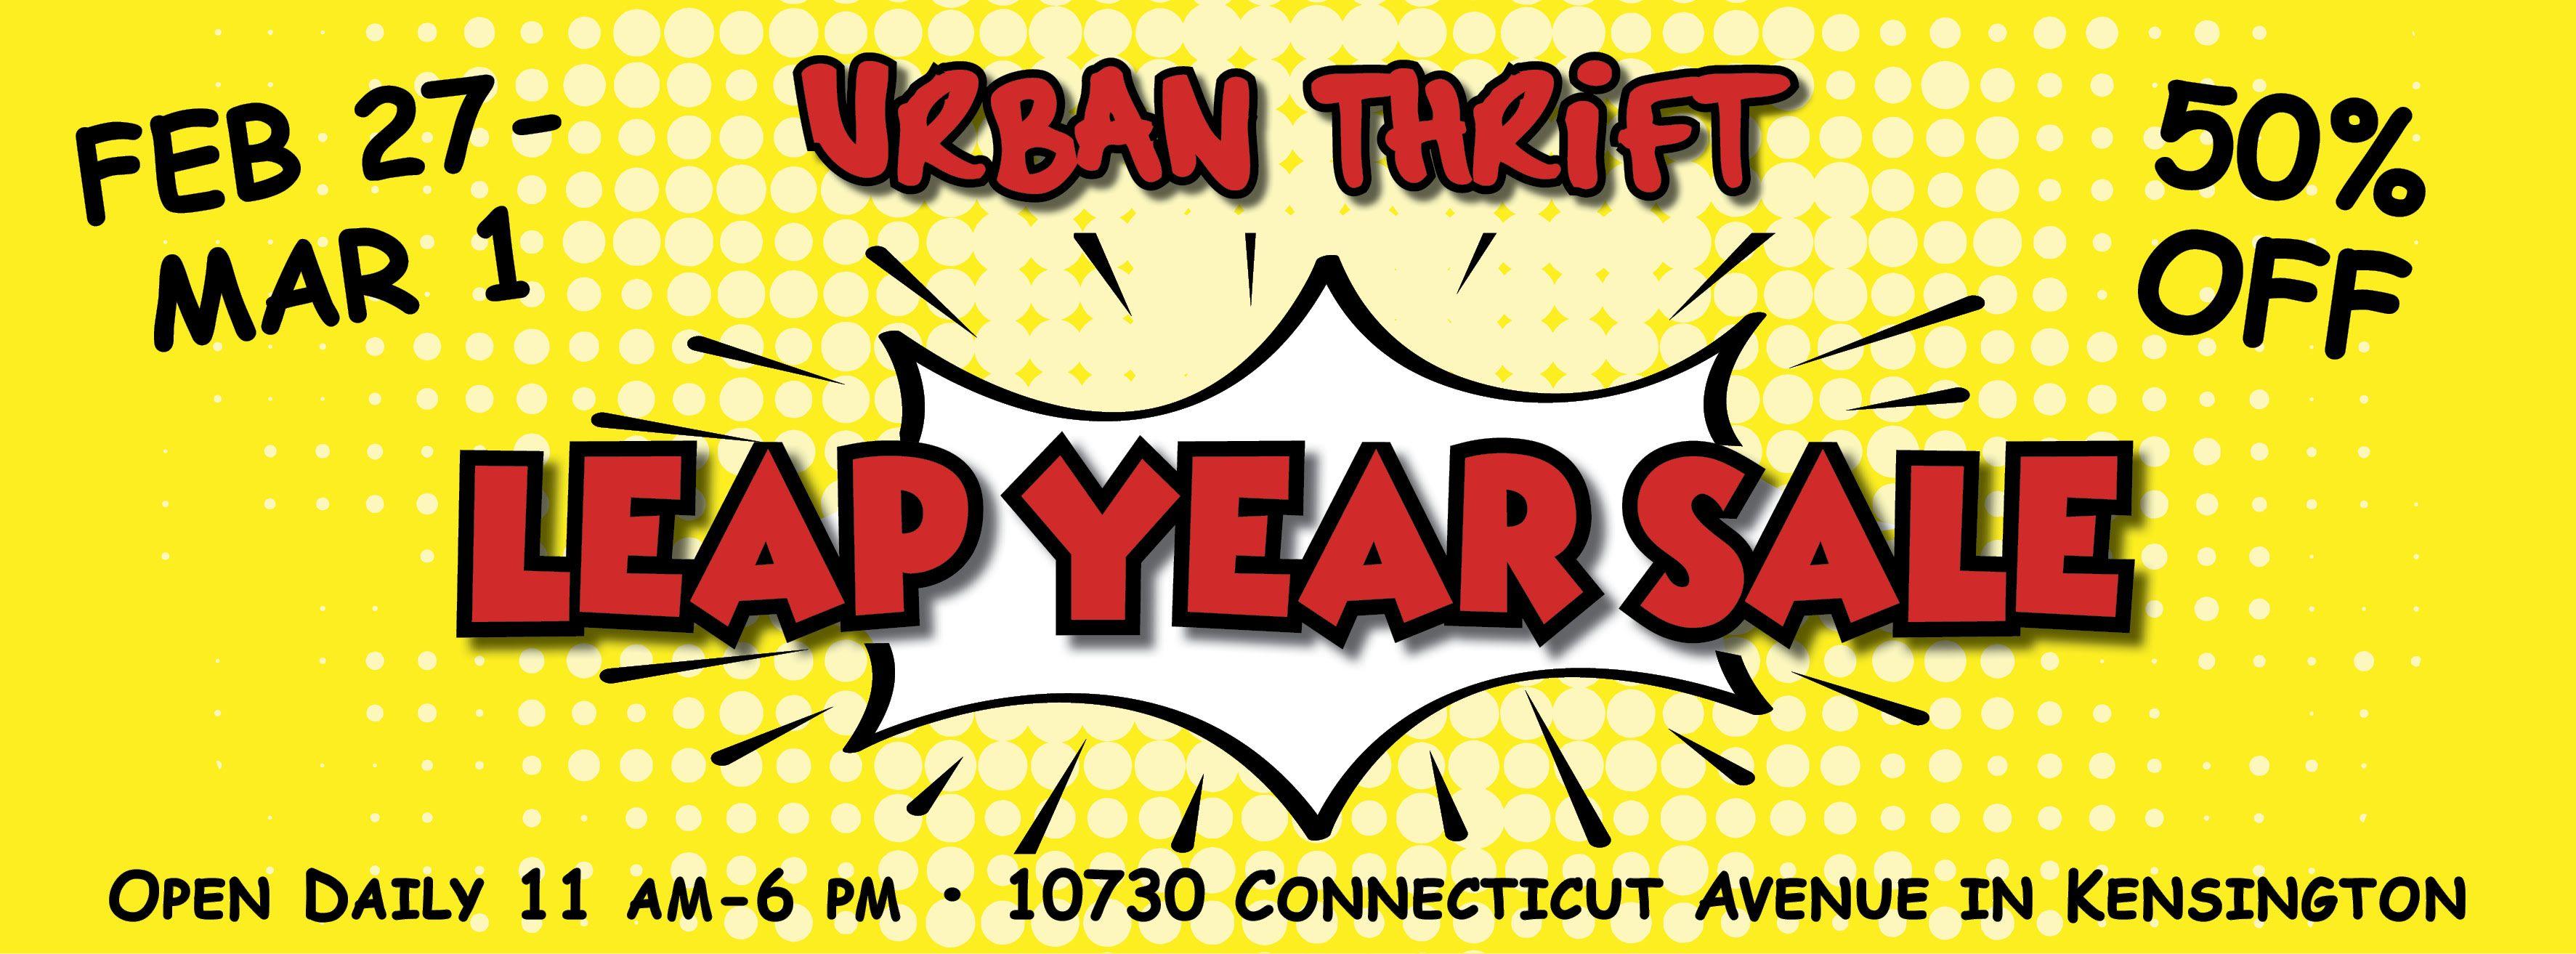 Urban Thrift Leap Year Sale